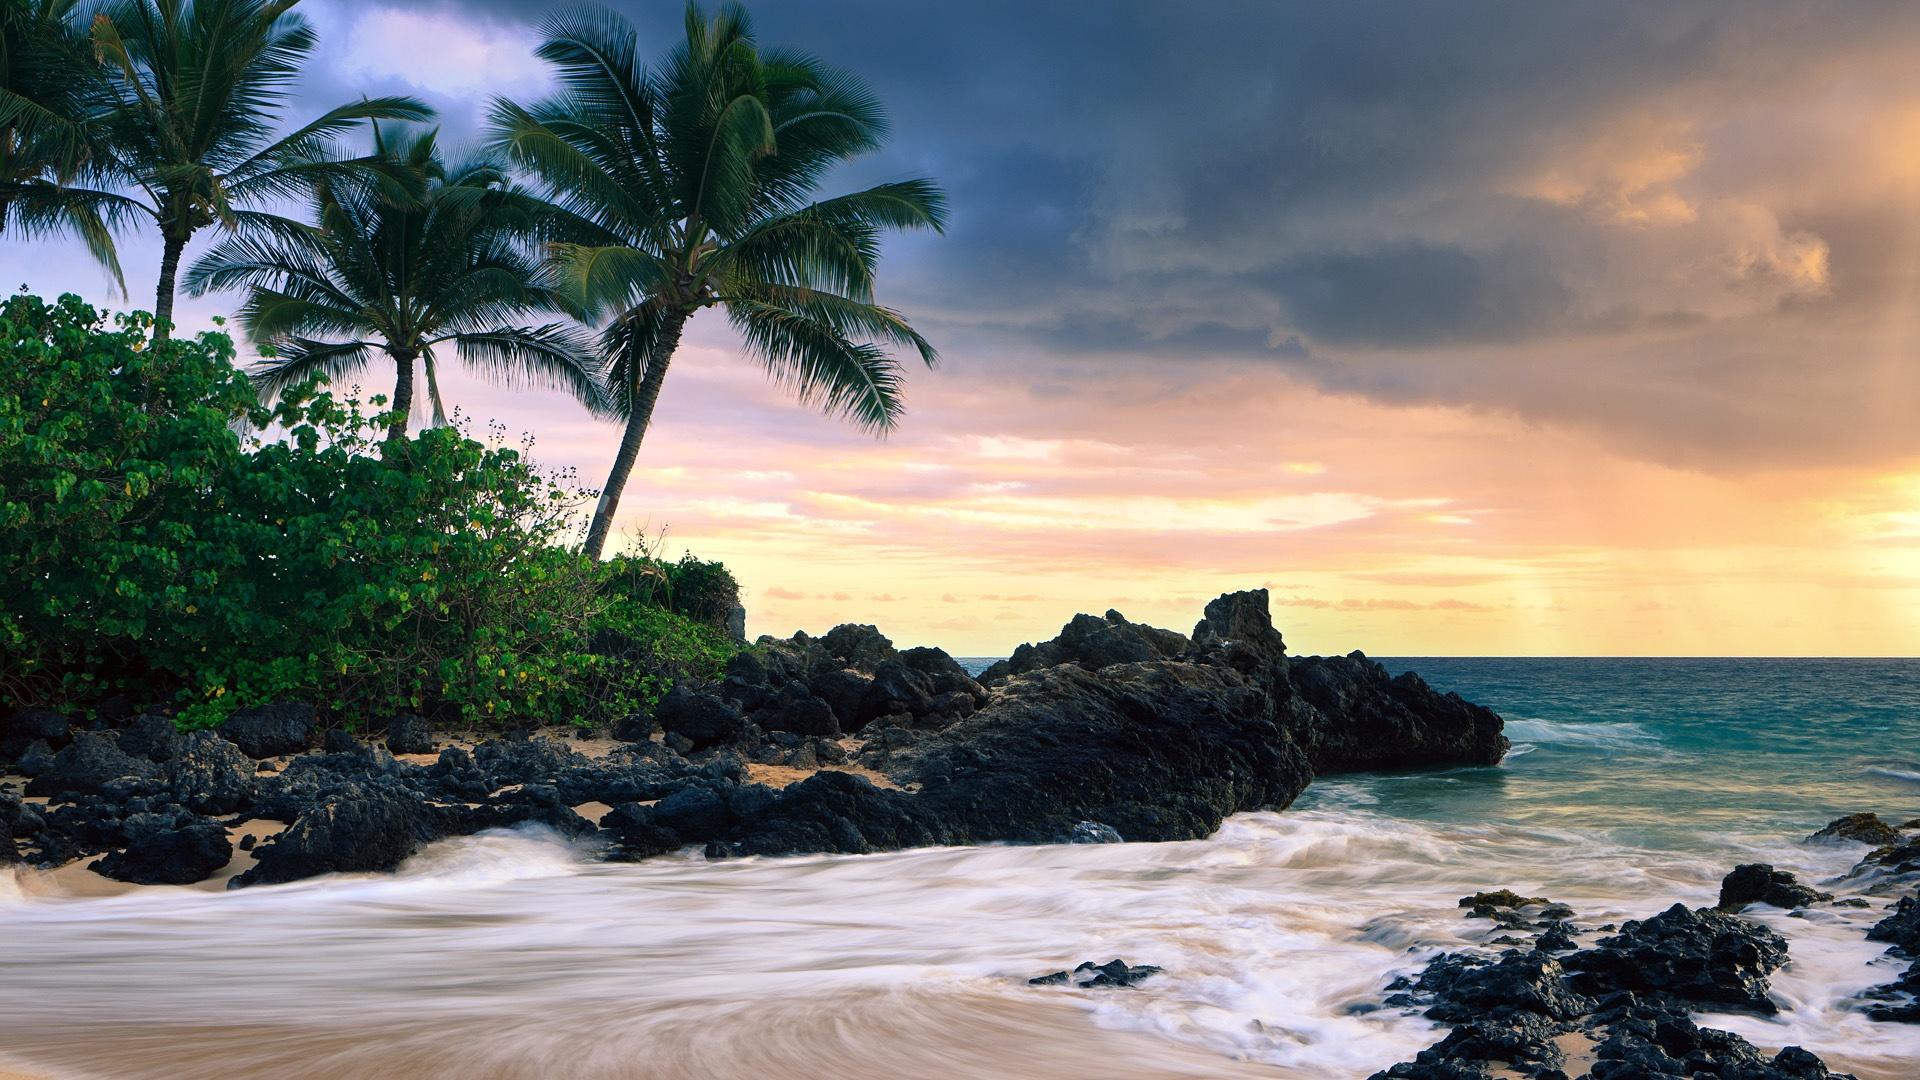 Tropical Beach HD Wallpapers 1920x1080